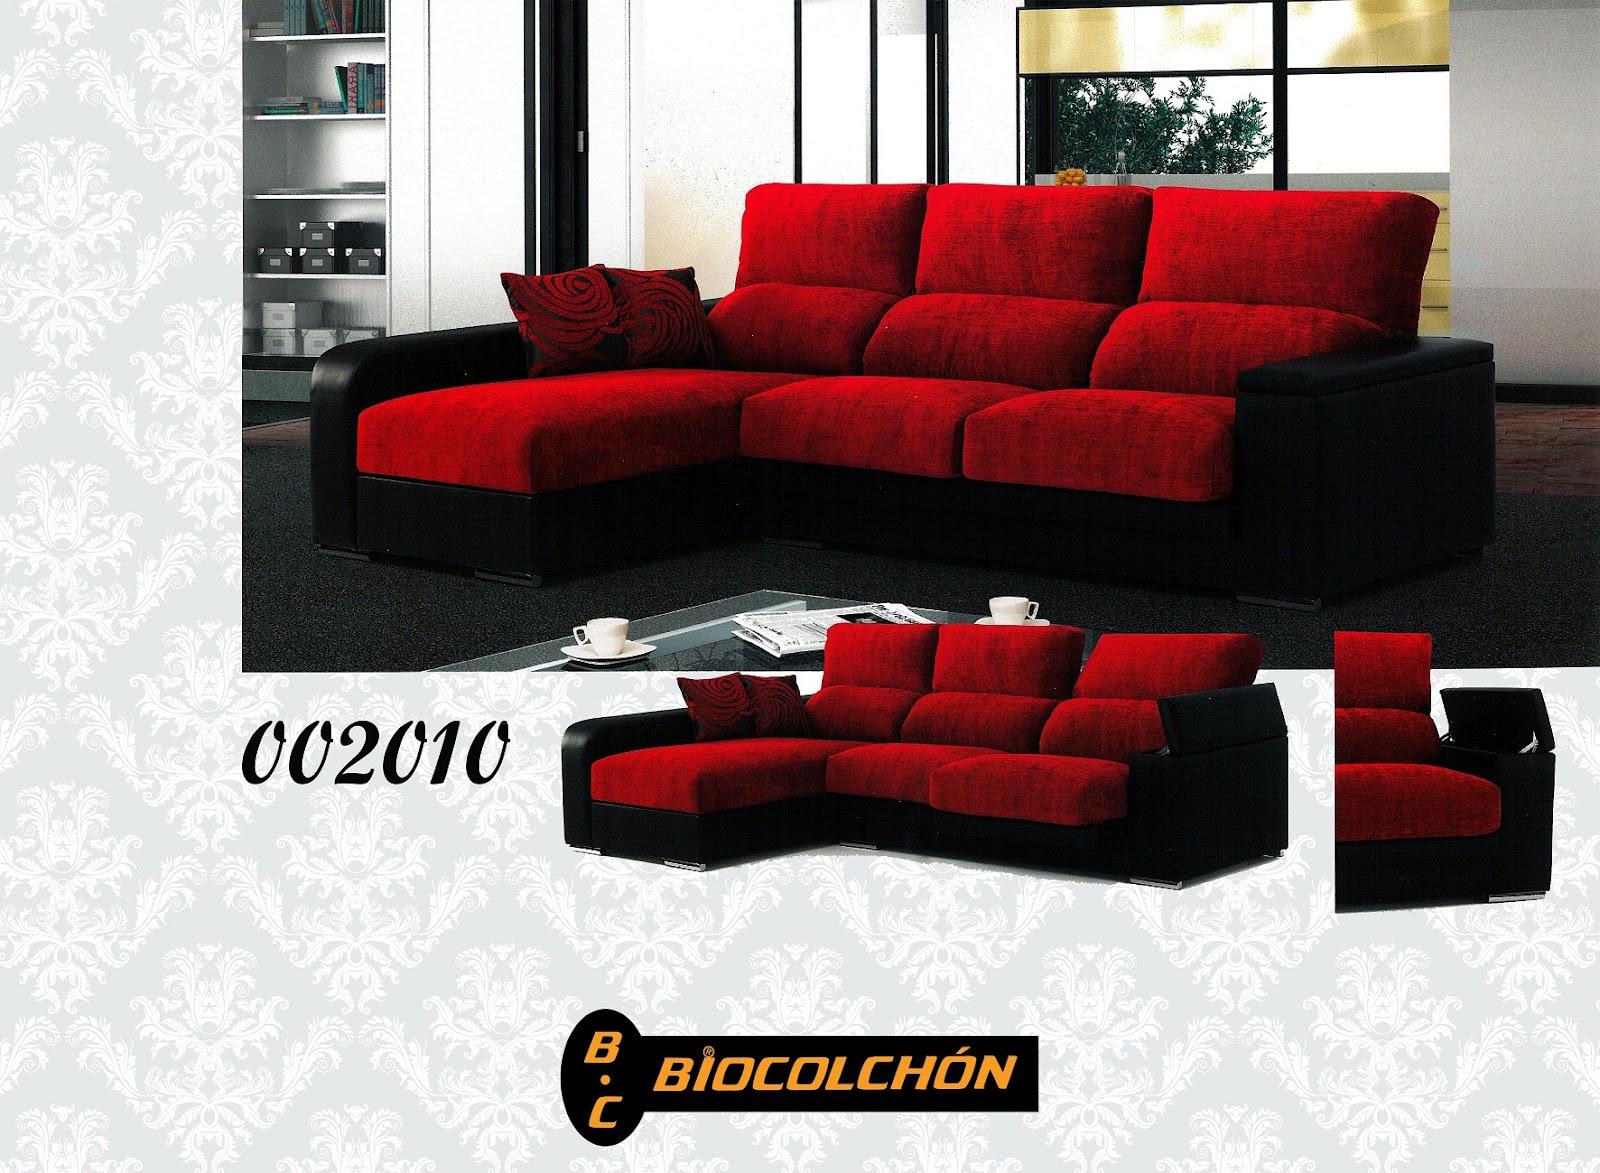 Biocolch n el blog del descanso cat logo especial sof s for Cheslong dos plazas